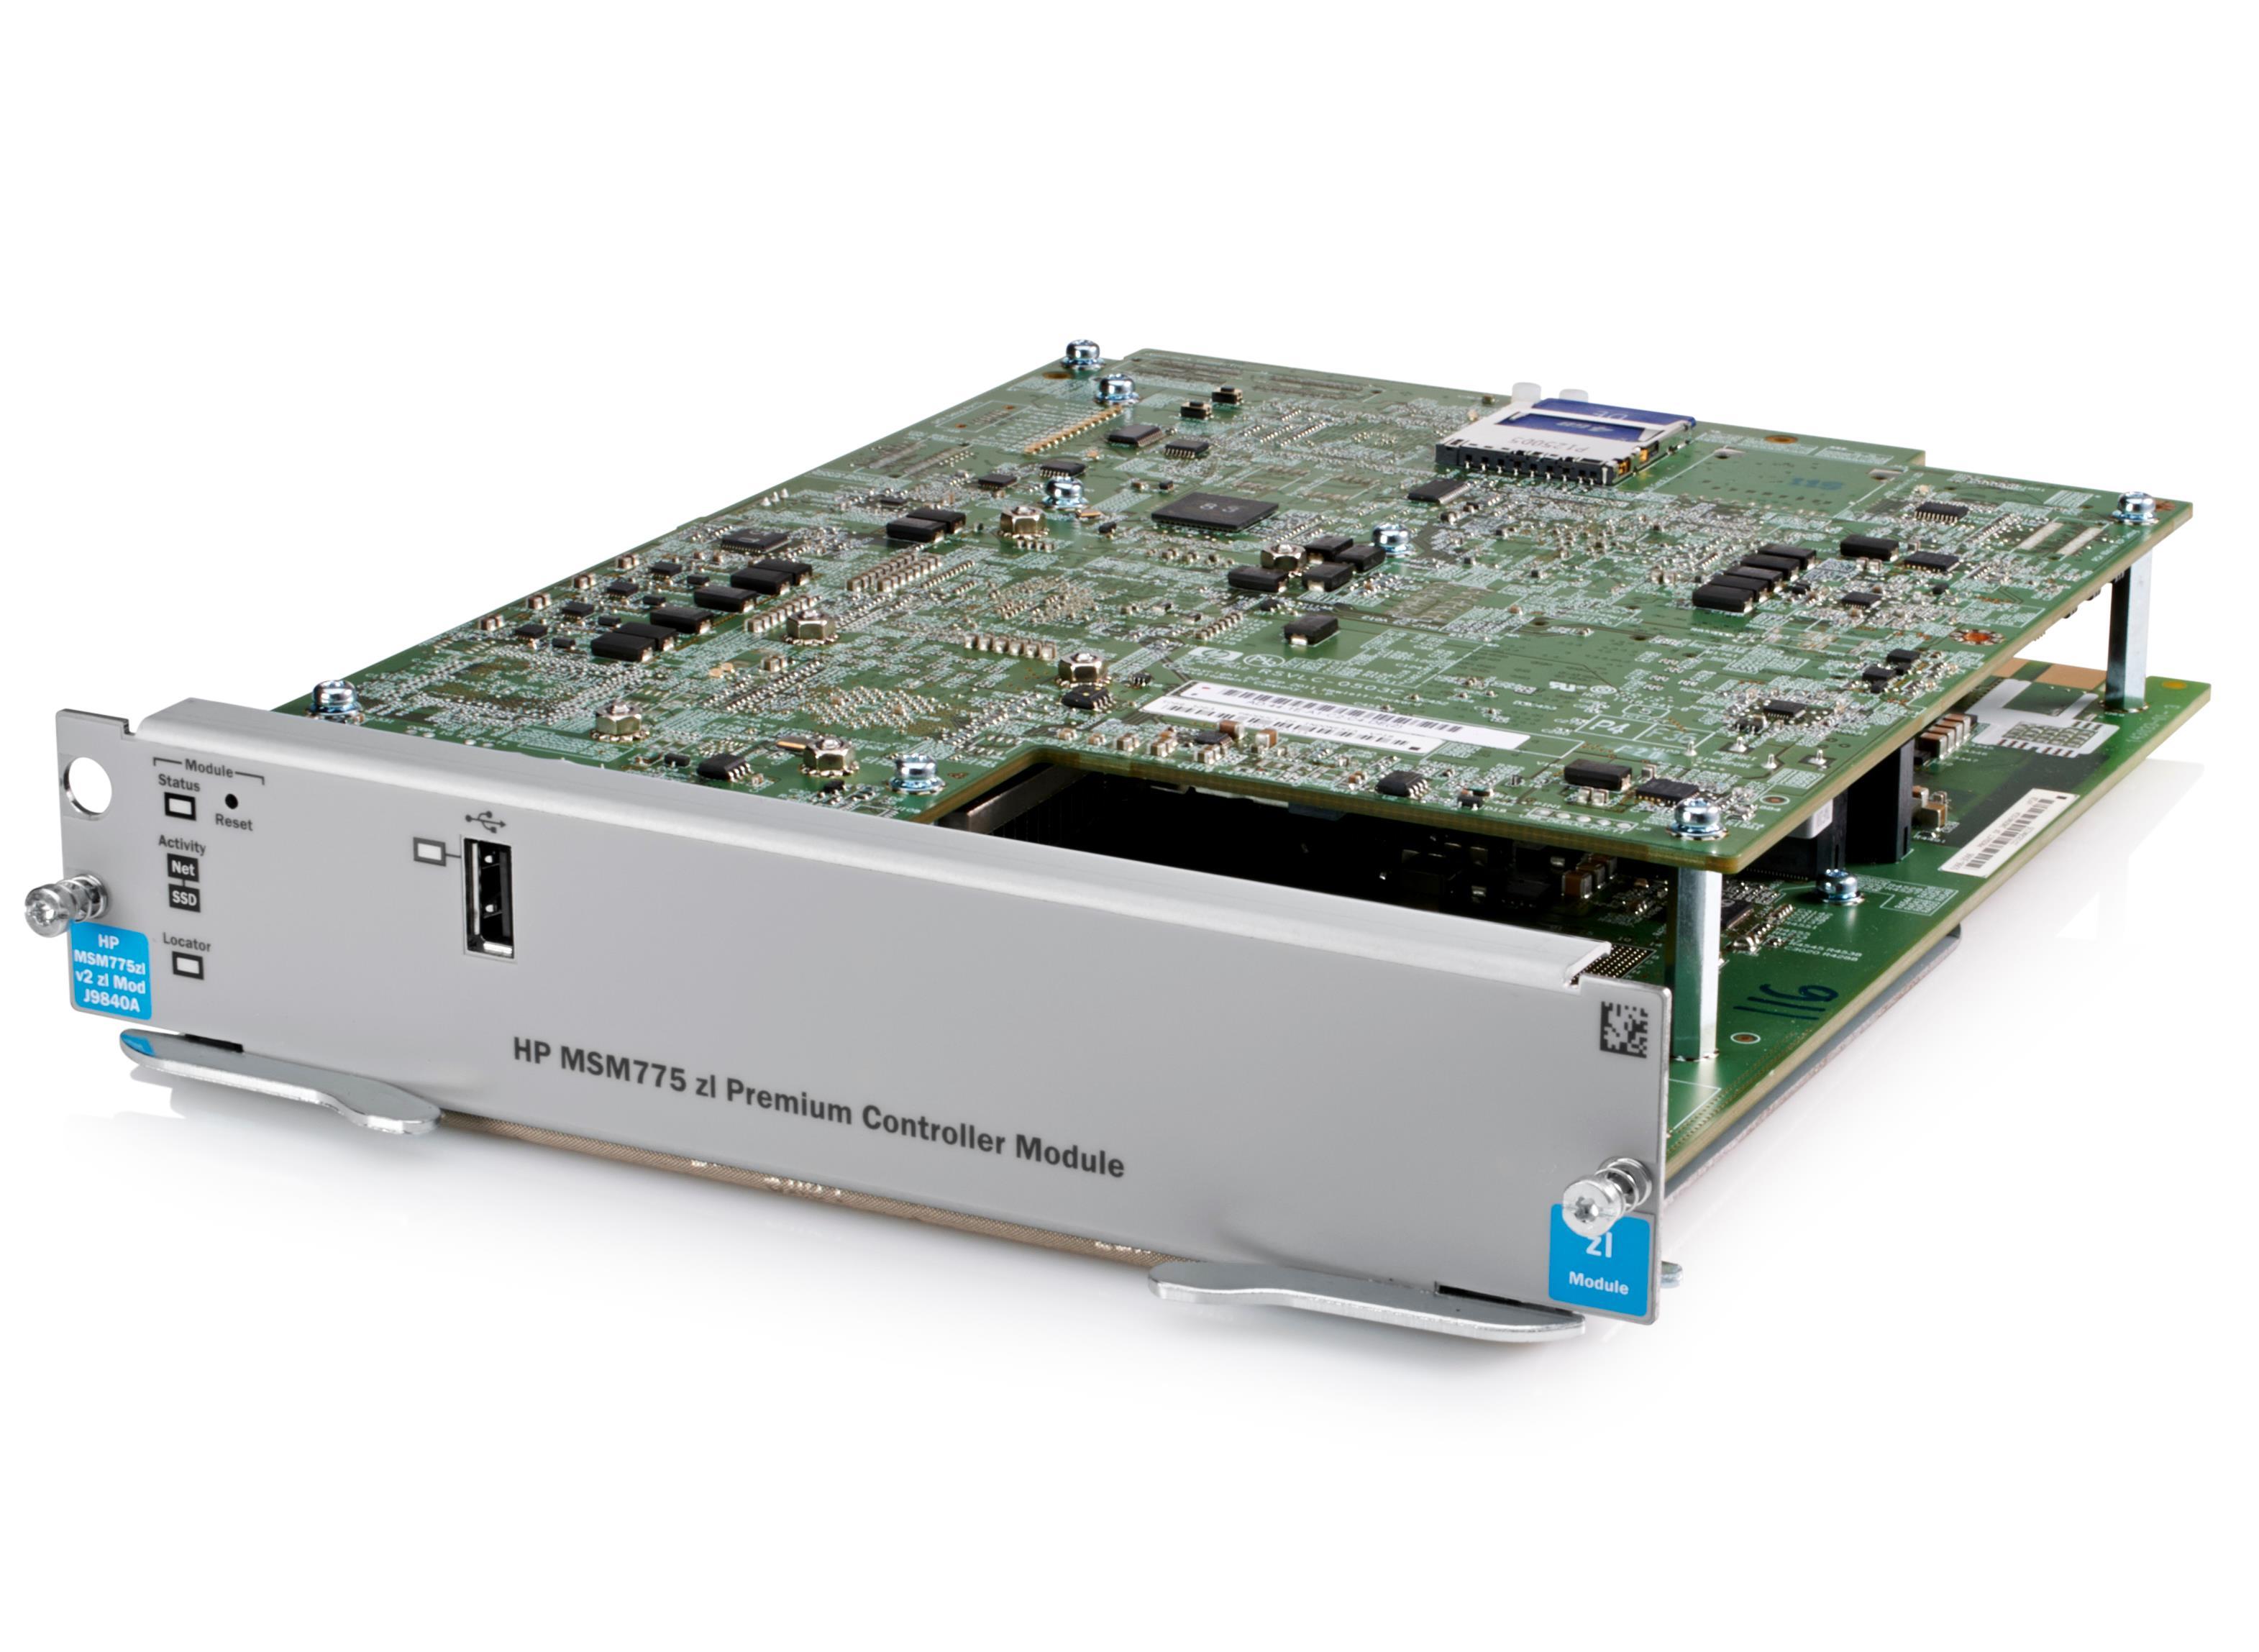 HP MSM775 zl Premium Controller Module